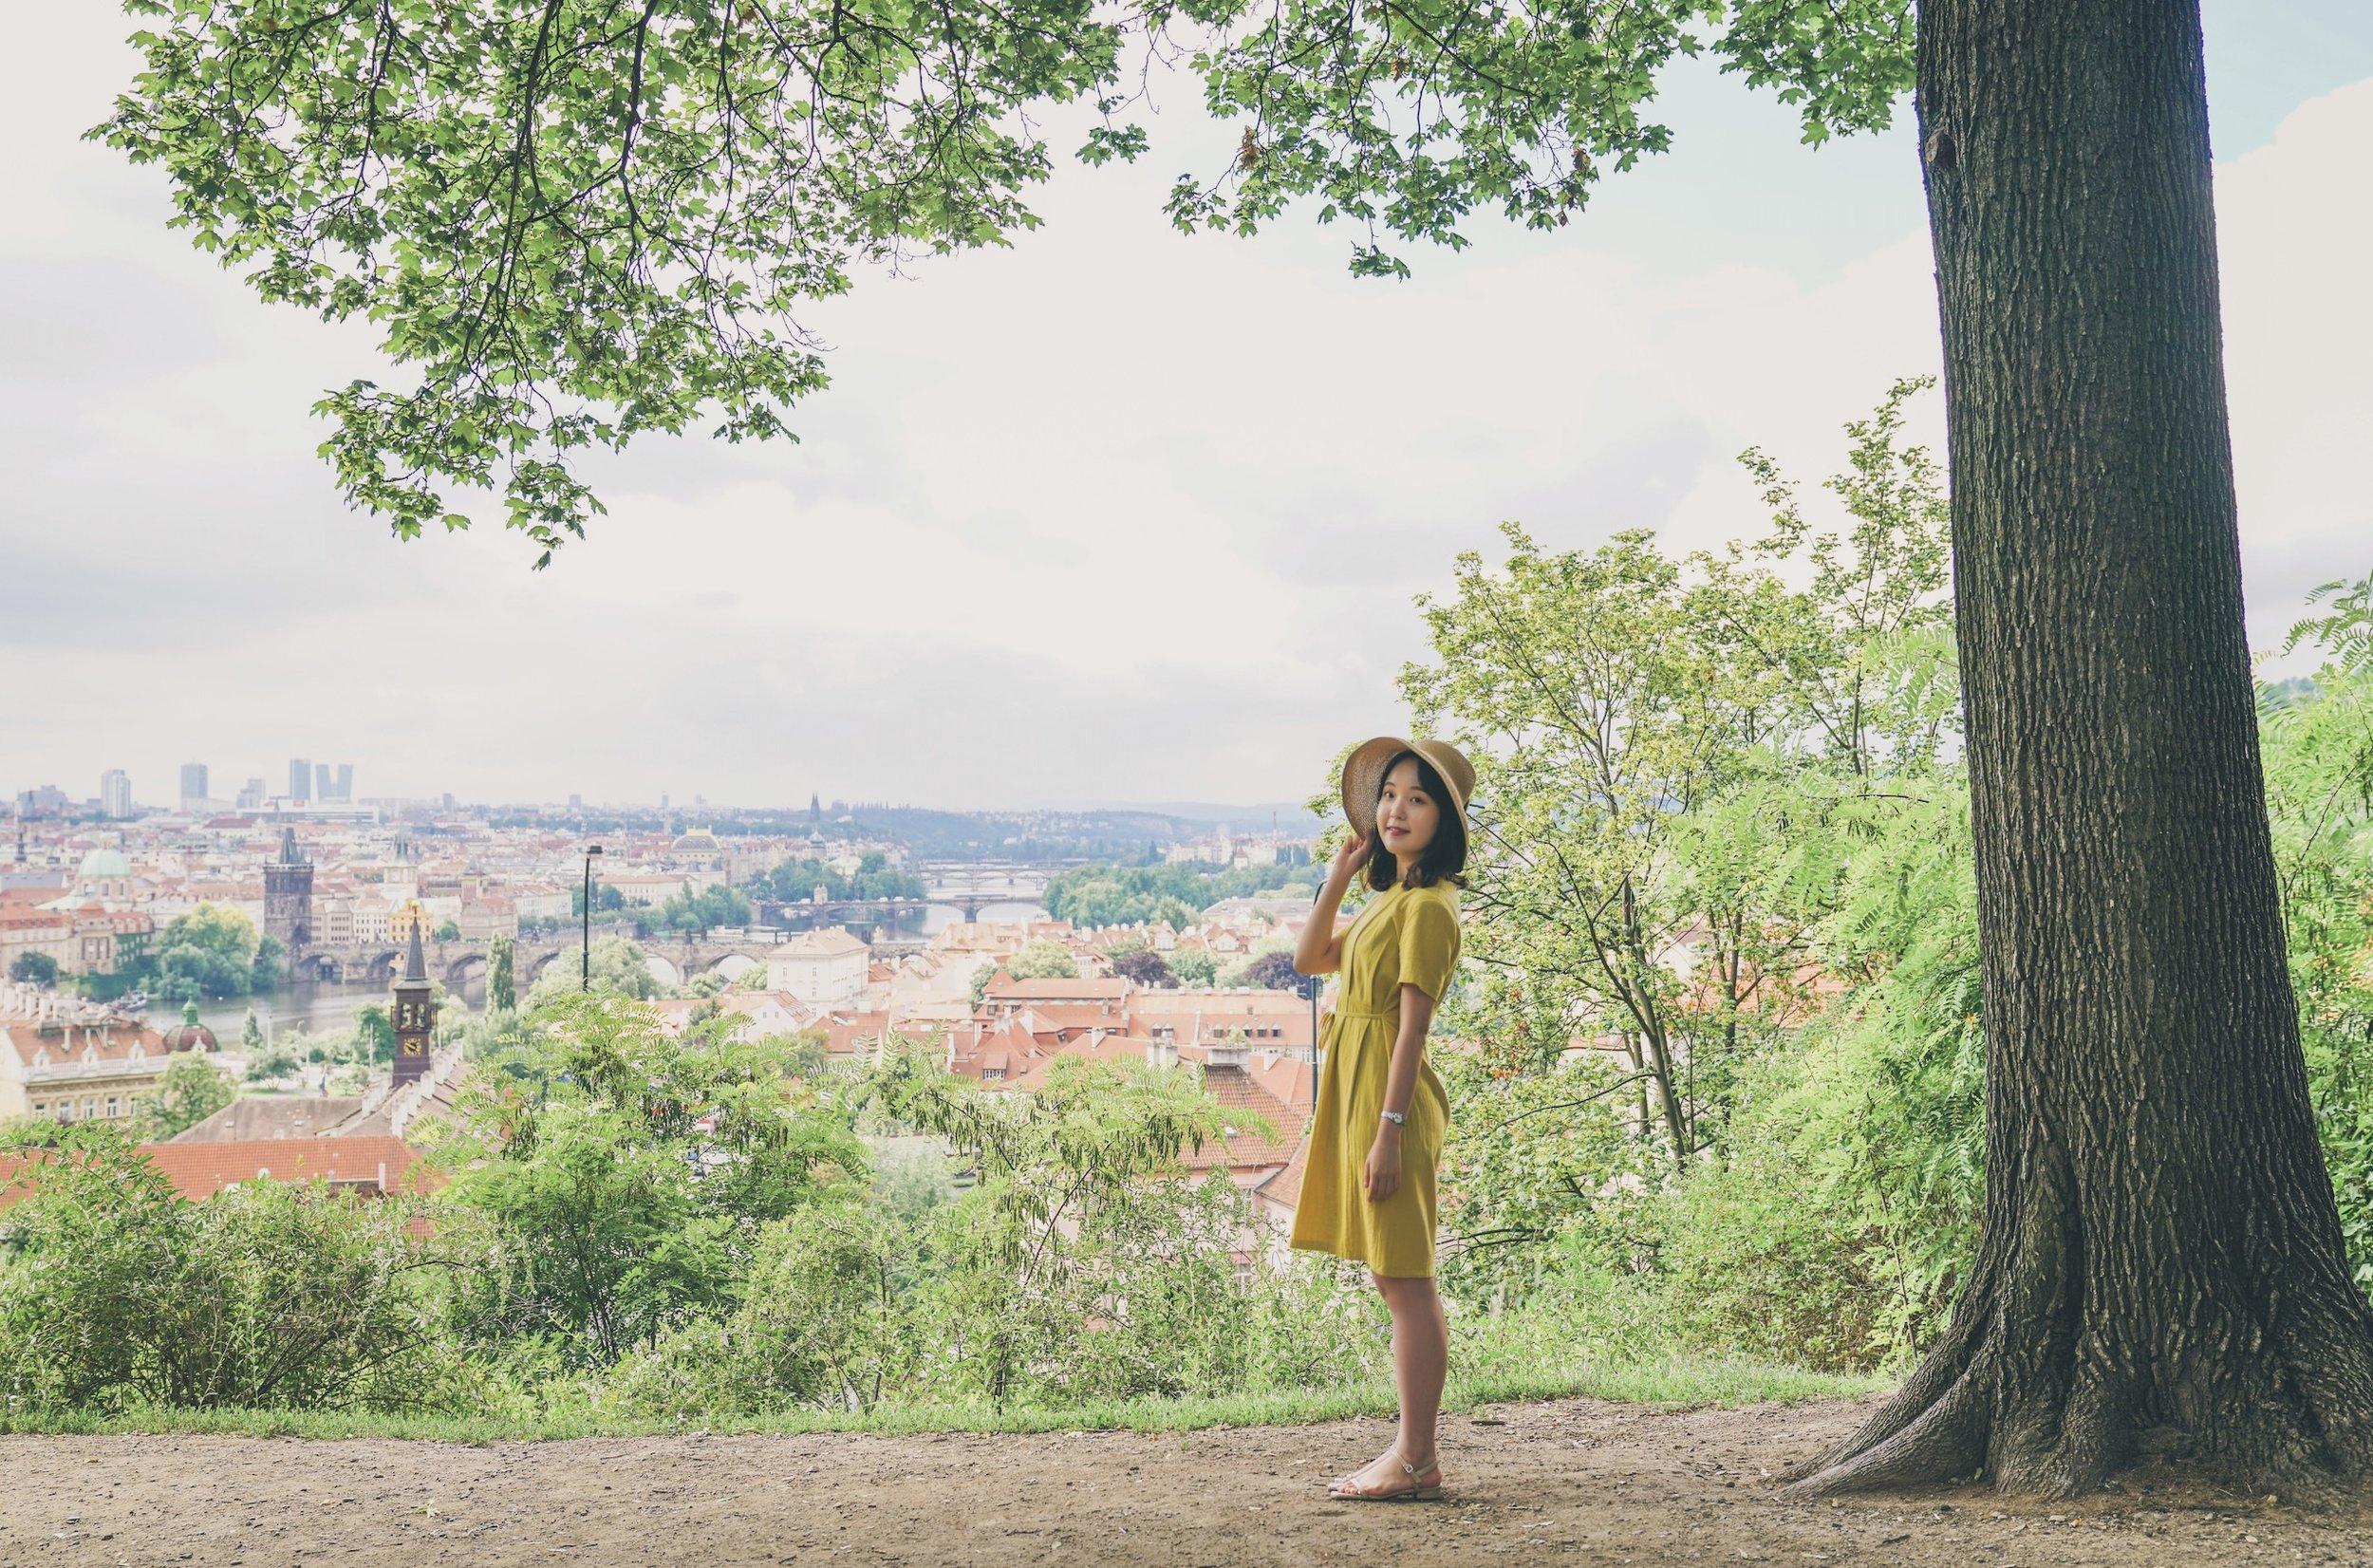 Sprazzi_Professional_Photography_Photographer_Prague_Czech-Republic_Irene_Original_20.jpg